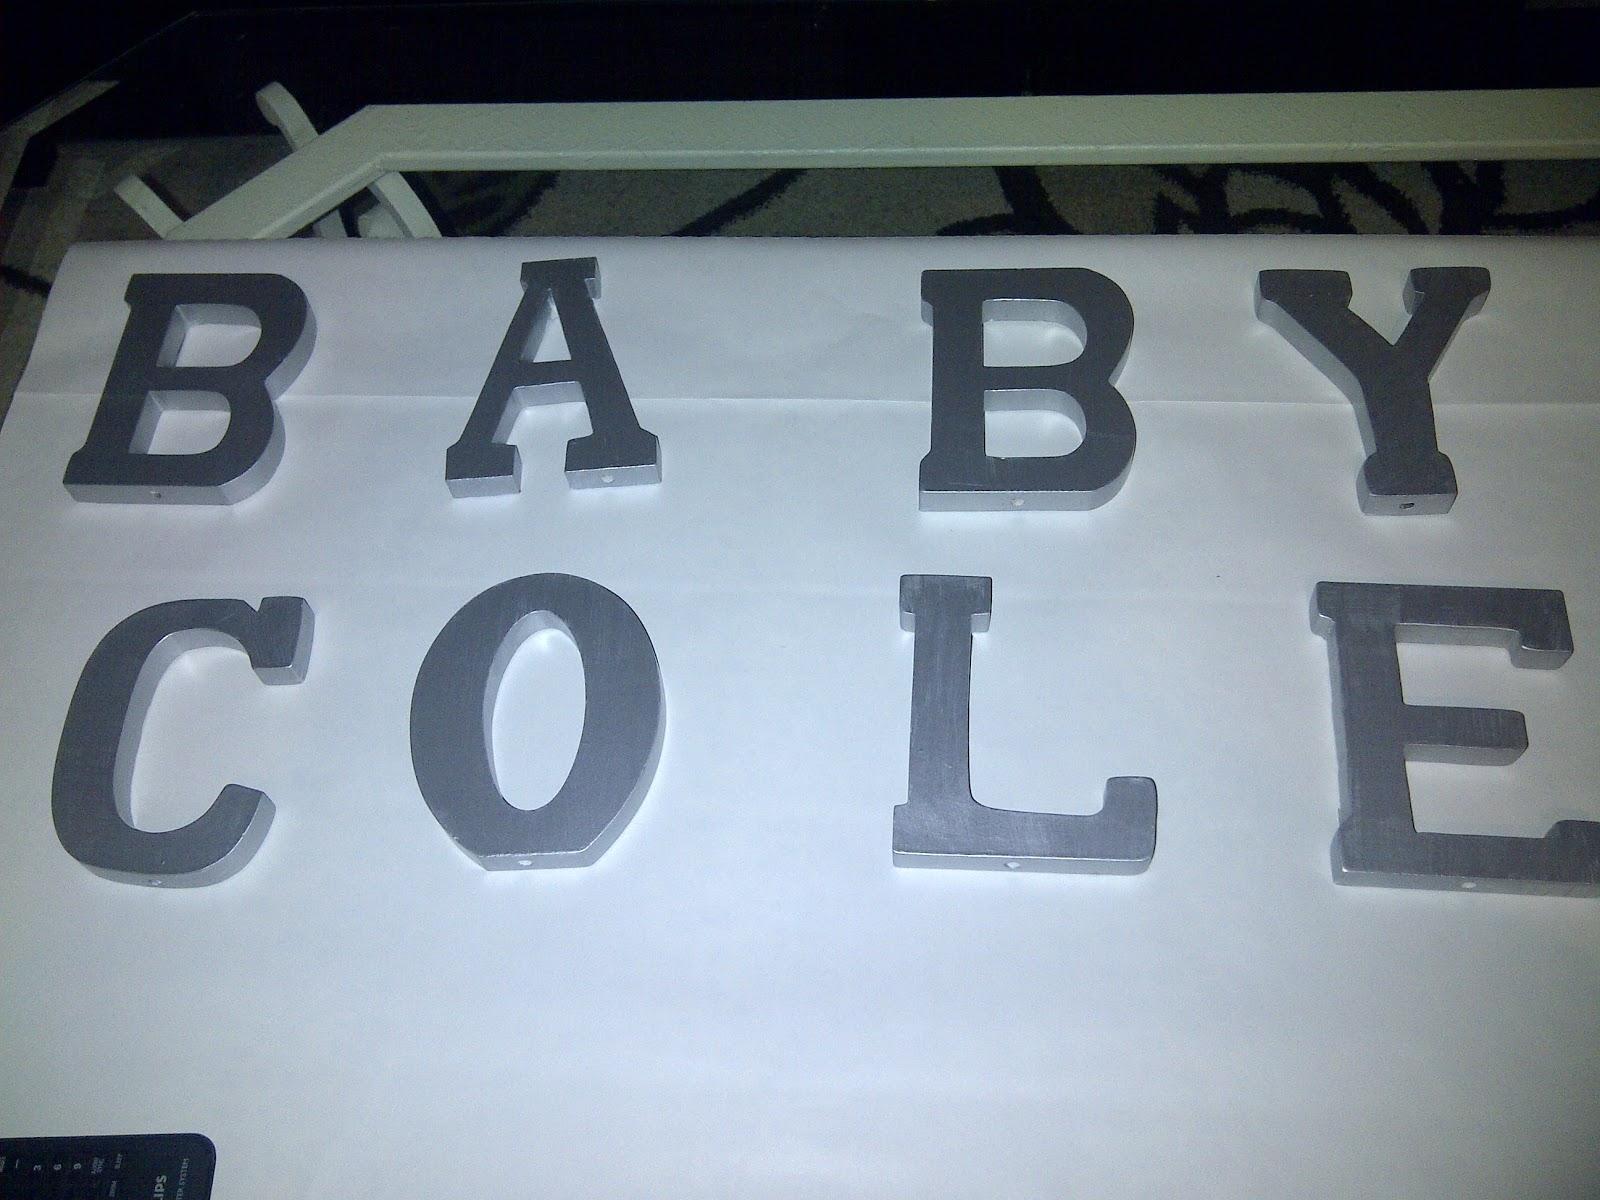 http://2.bp.blogspot.com/_-5MX3xtHT5k/TUNJVmnXwYI/AAAAAAAAAq4/WIPpUTsV_1o/s1600/cole+letters.jpg